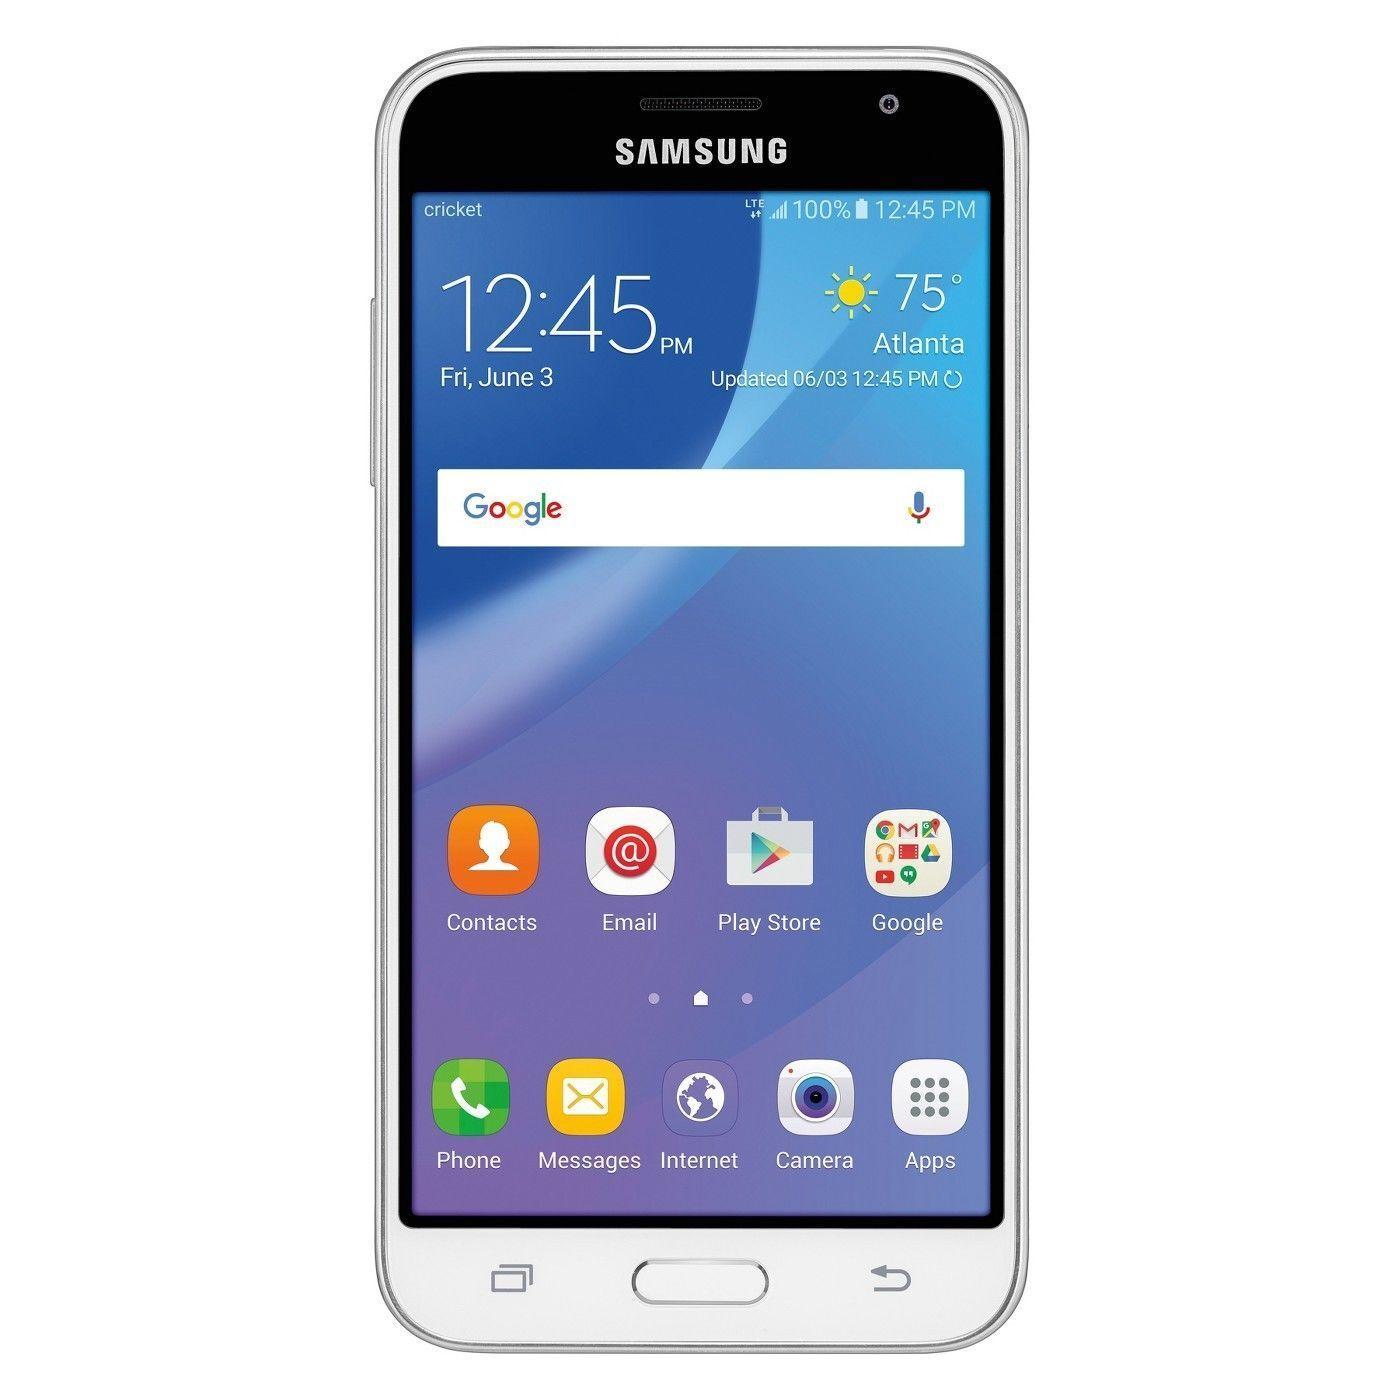 Samsung Galaxy Amp Prime SM-J320AZ - 16GB - White (Cricket) Smartphone